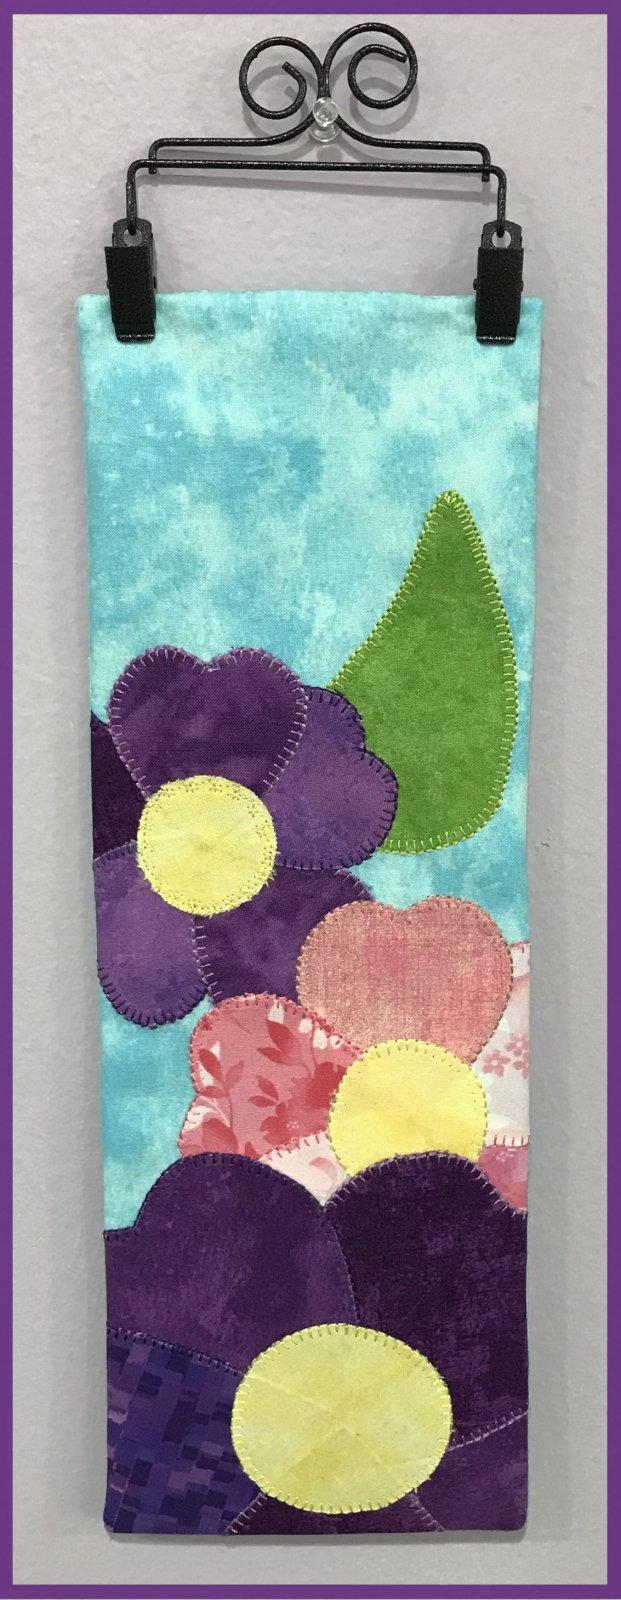 May Door-Nament Kit 5/3/21